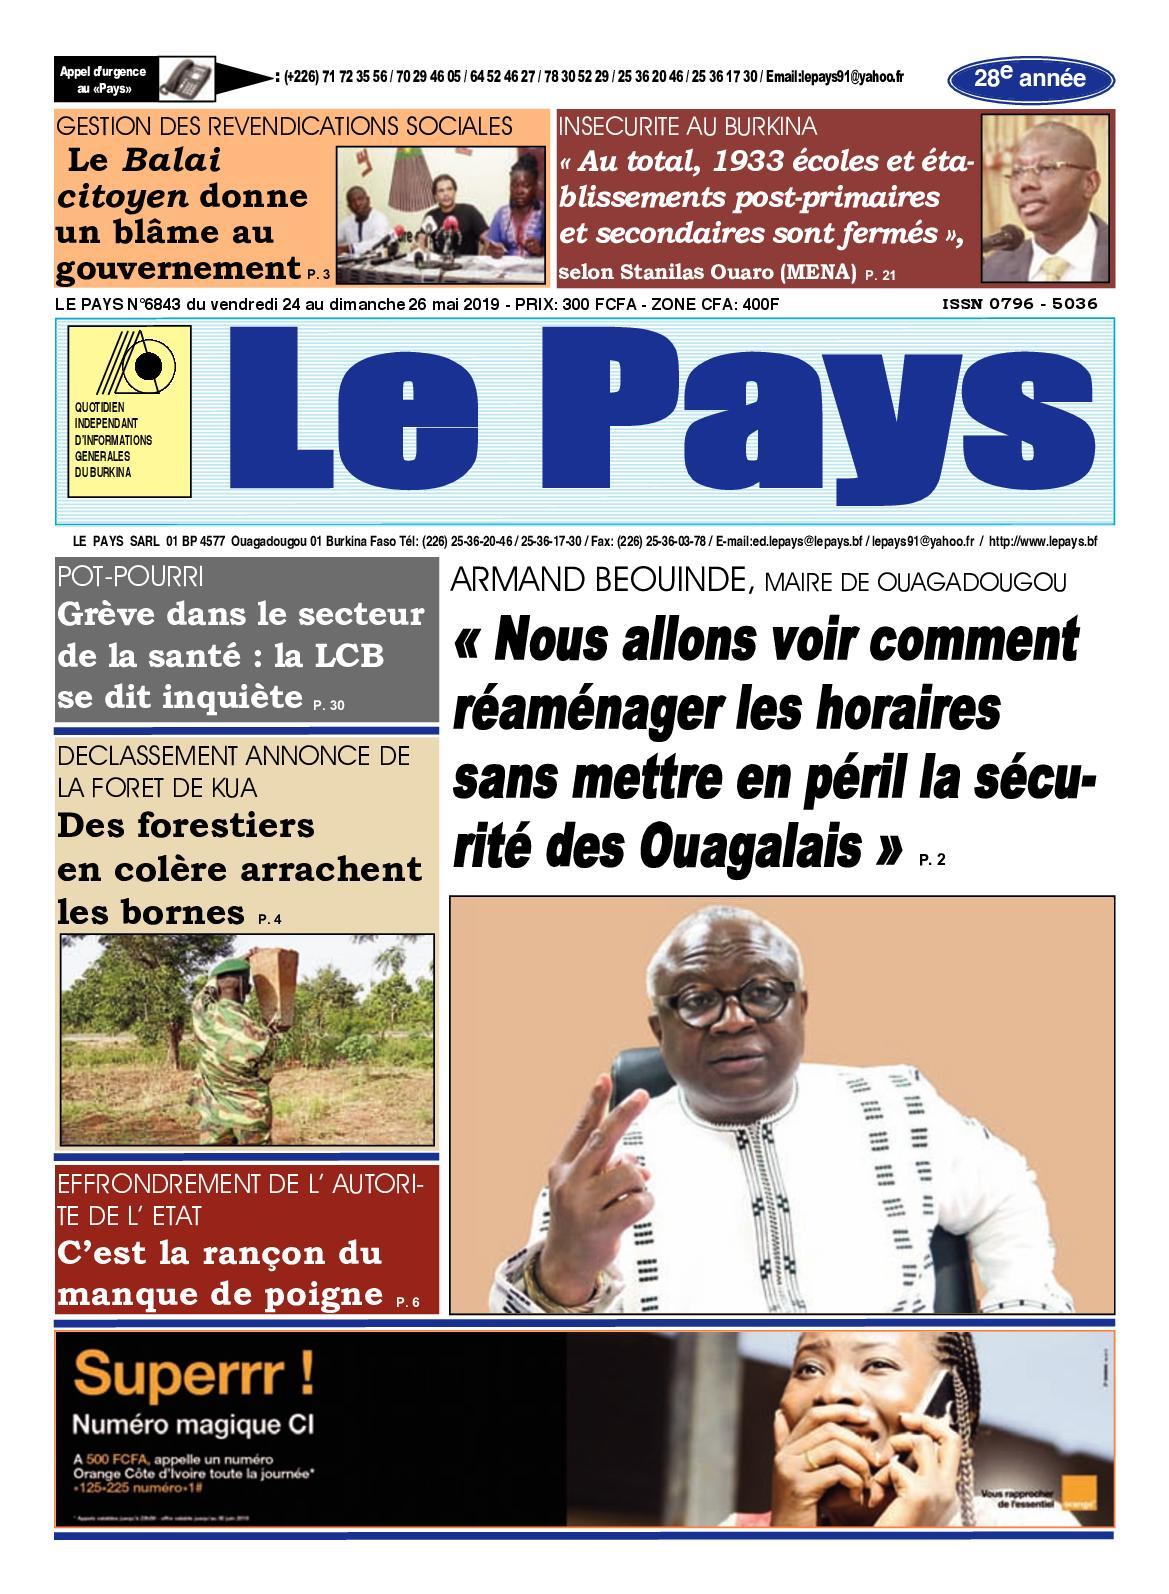 Rembert Van Damme au Burkina Faso